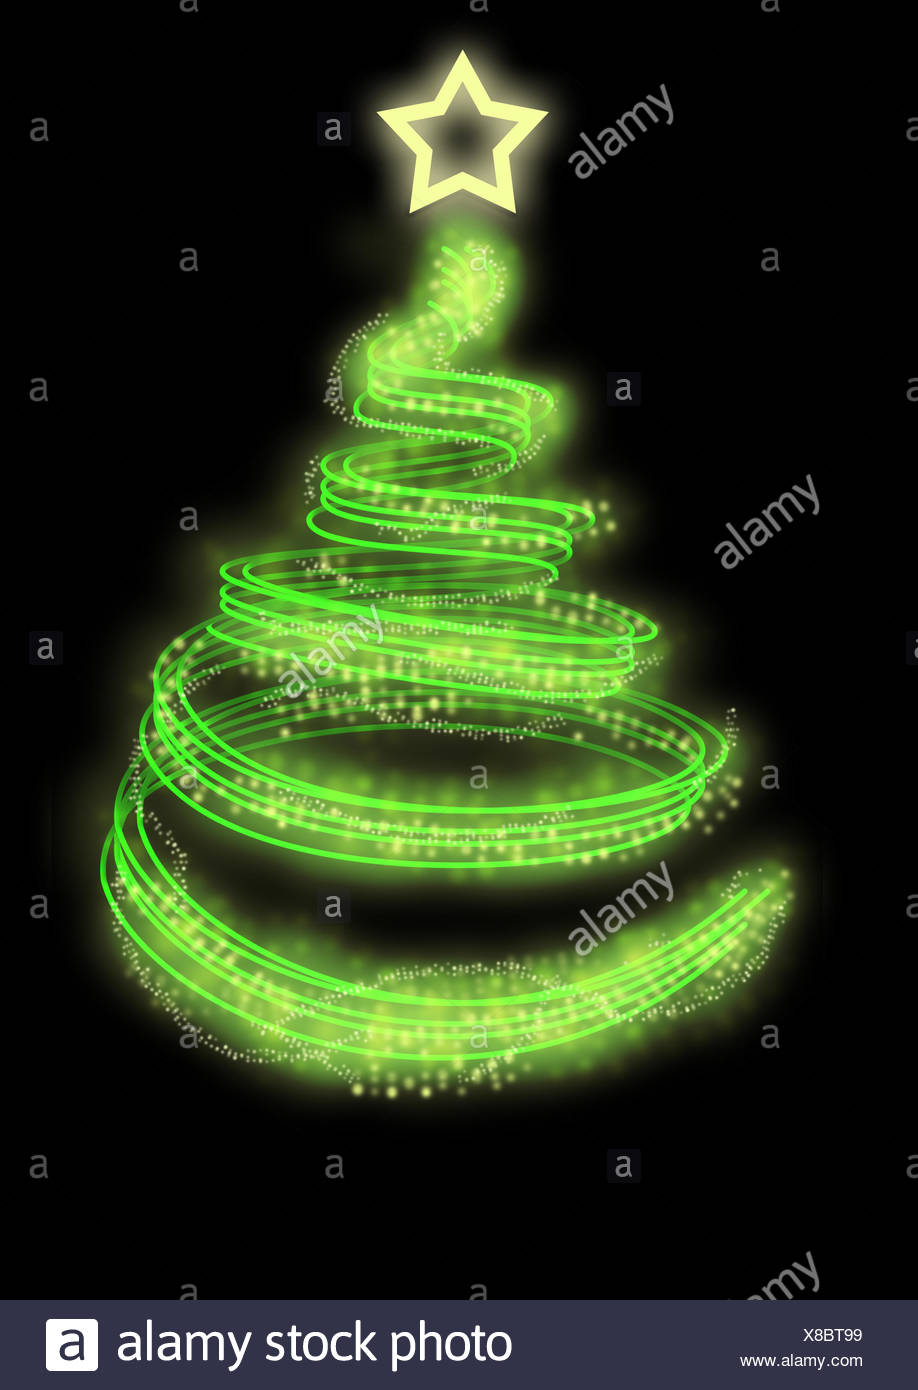 Spiral Christmas Tree Stock Photos & Spiral Christmas Tree Stock ...